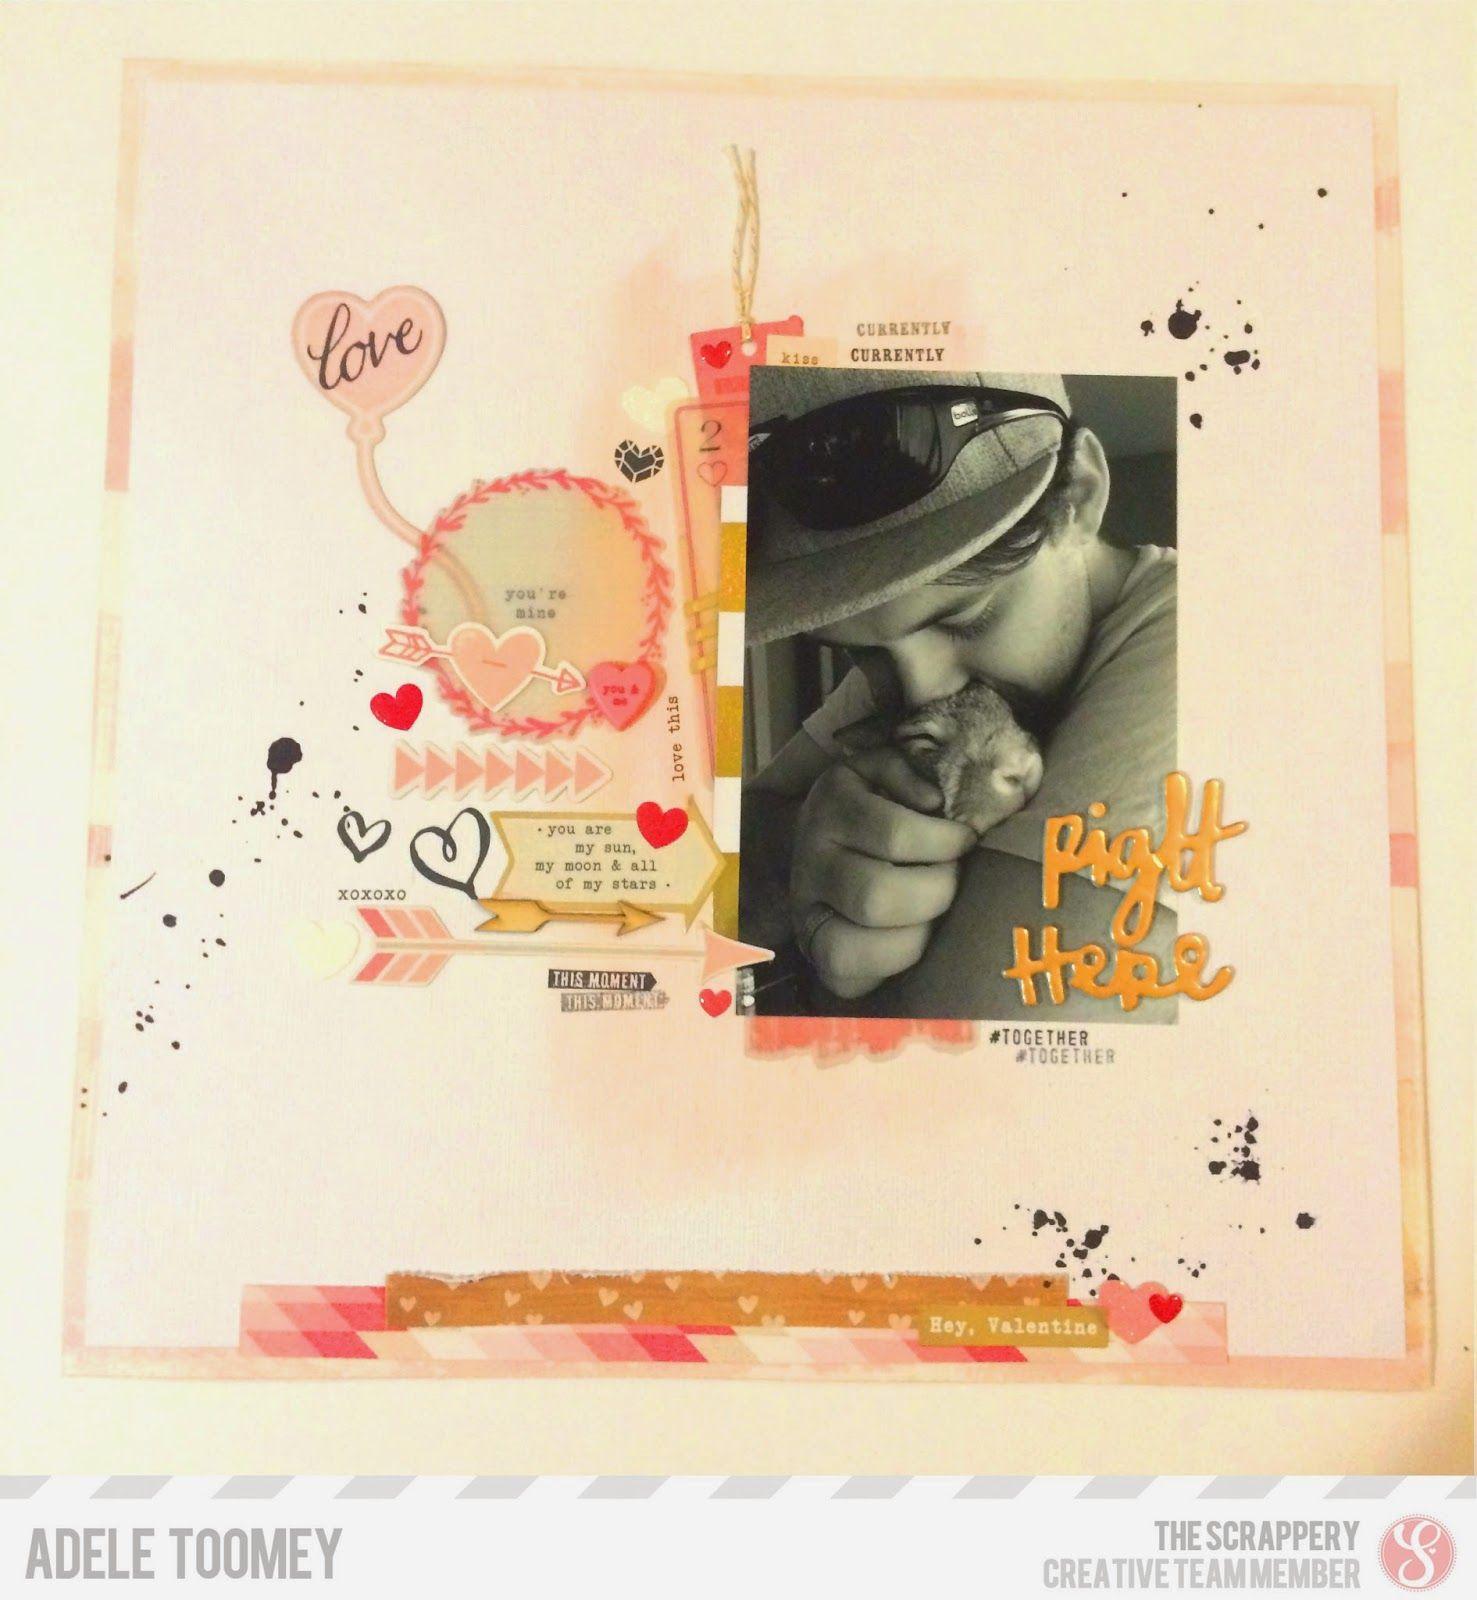 Juliet scrapbook ideas - Tsk Bella Plk Juliette Bpk Valerie Kill A Kit Adele Julietquilladelefescrapbook Layoutsnicemaps